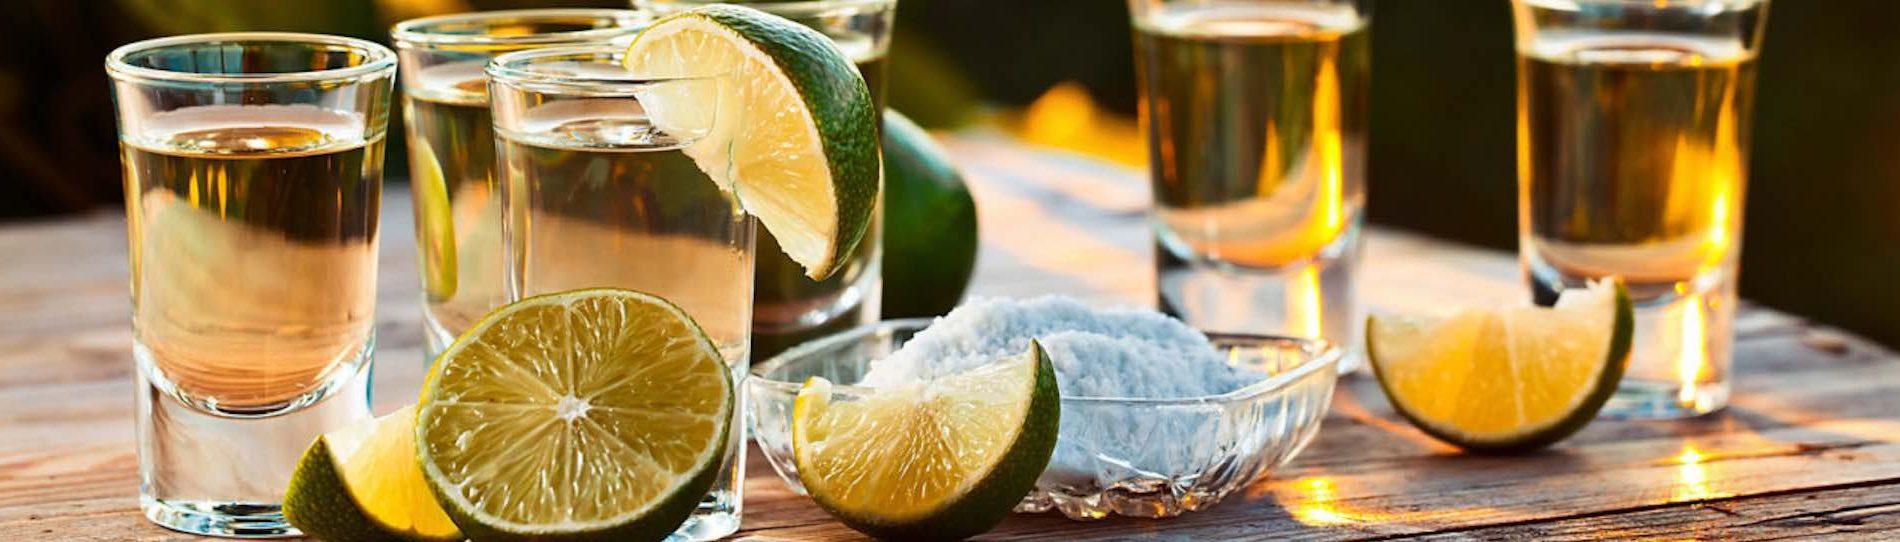 melbourne tequila tasting